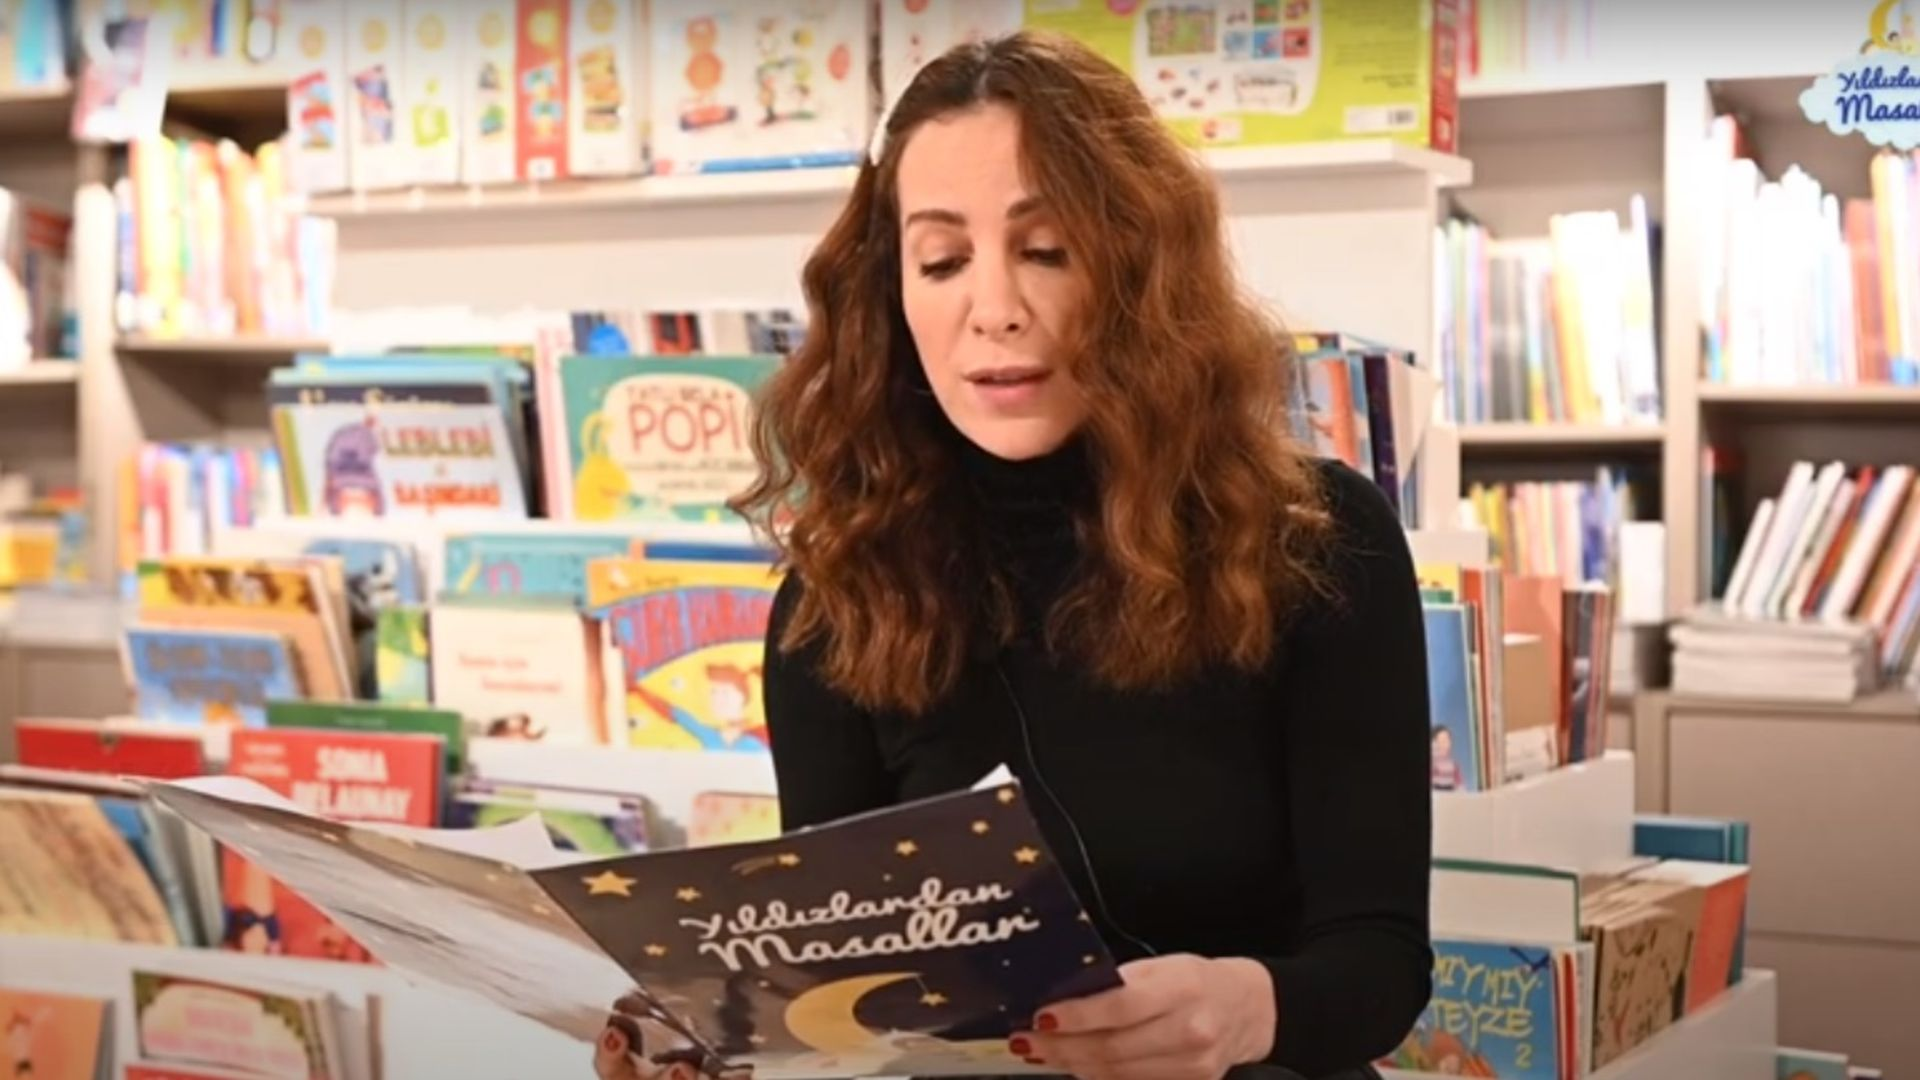 Fatma TOPTAŞ Polyanna masalını okuyor